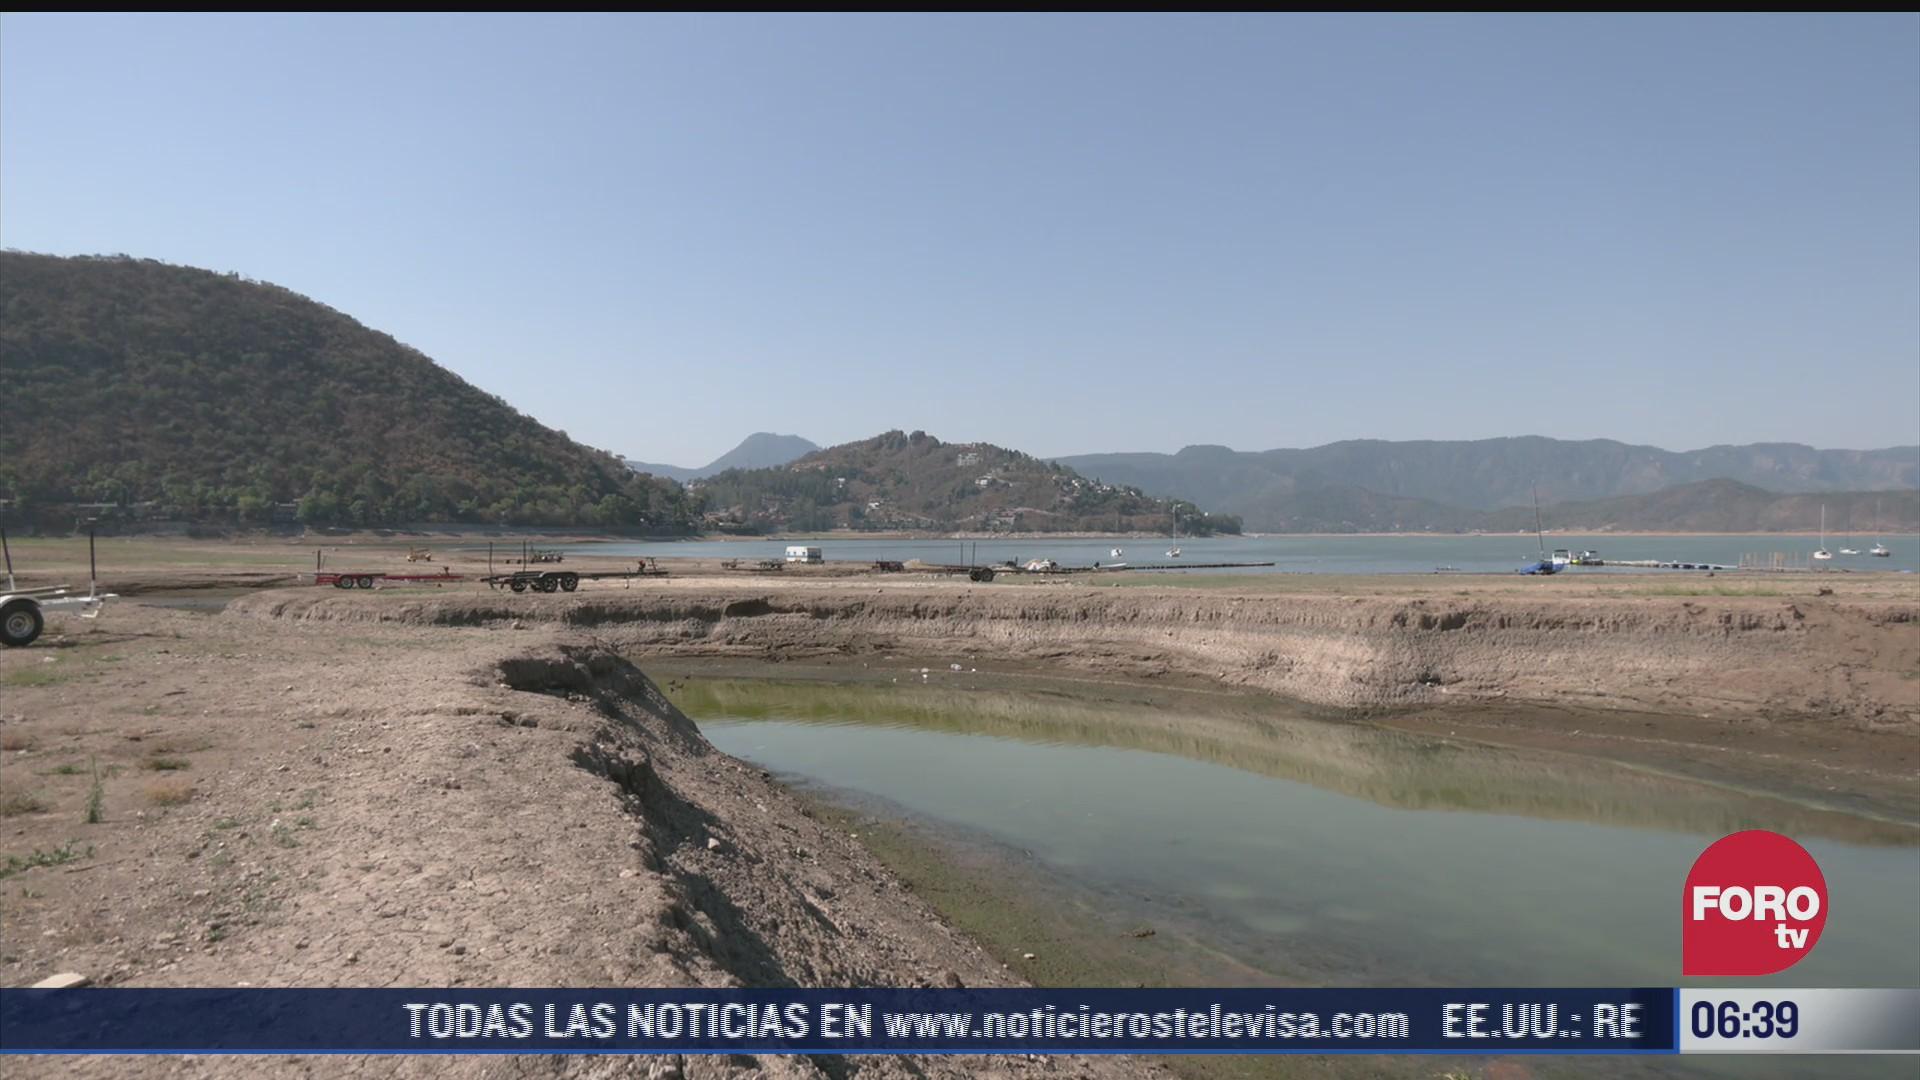 expertos piden tomar medidas para ahorrar consumo de agua